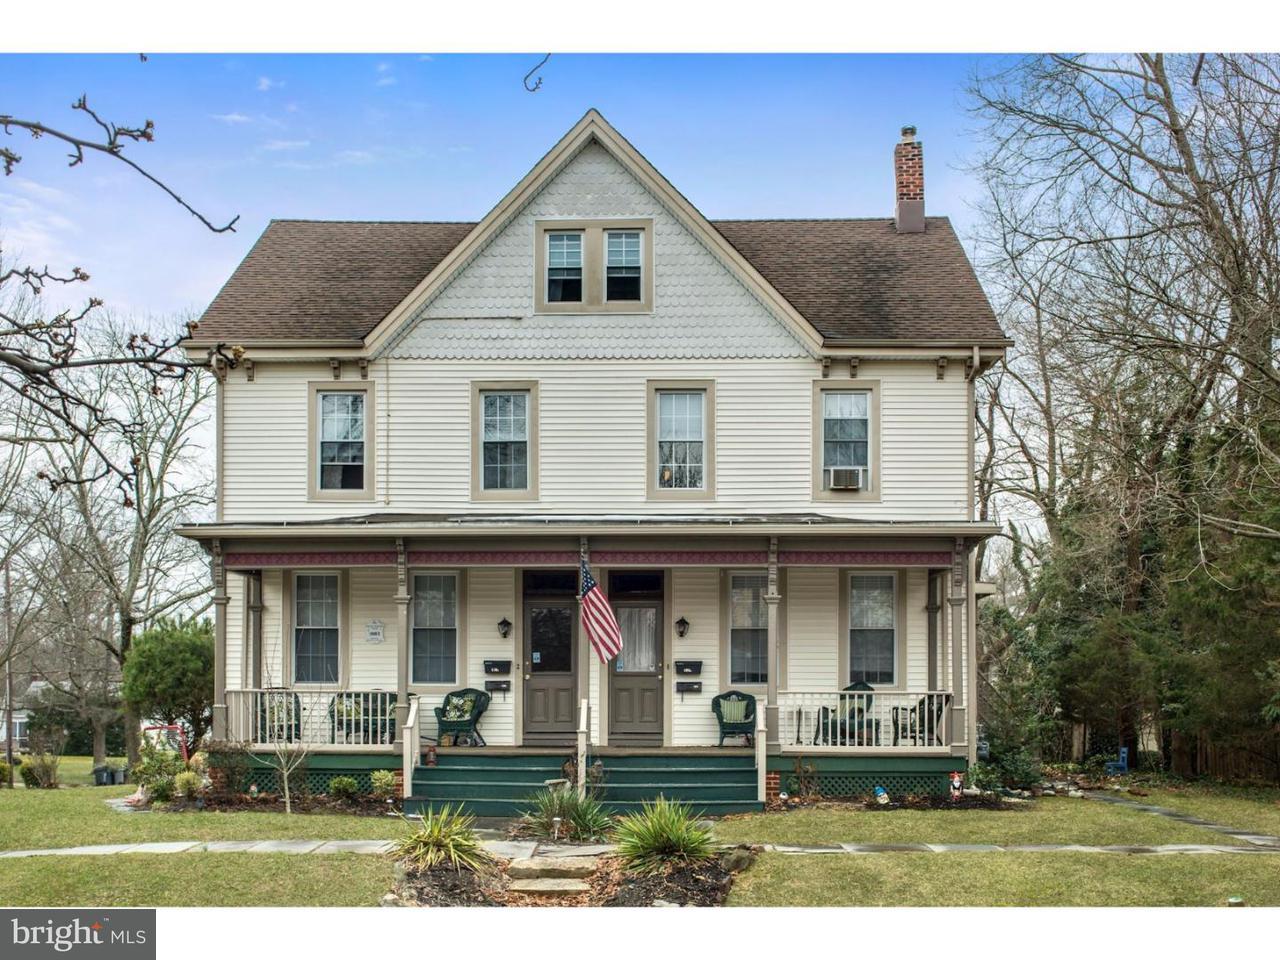 Quadraplex for Sale at 108-110 E ELM Street Wenonah, New Jersey 08090 United States